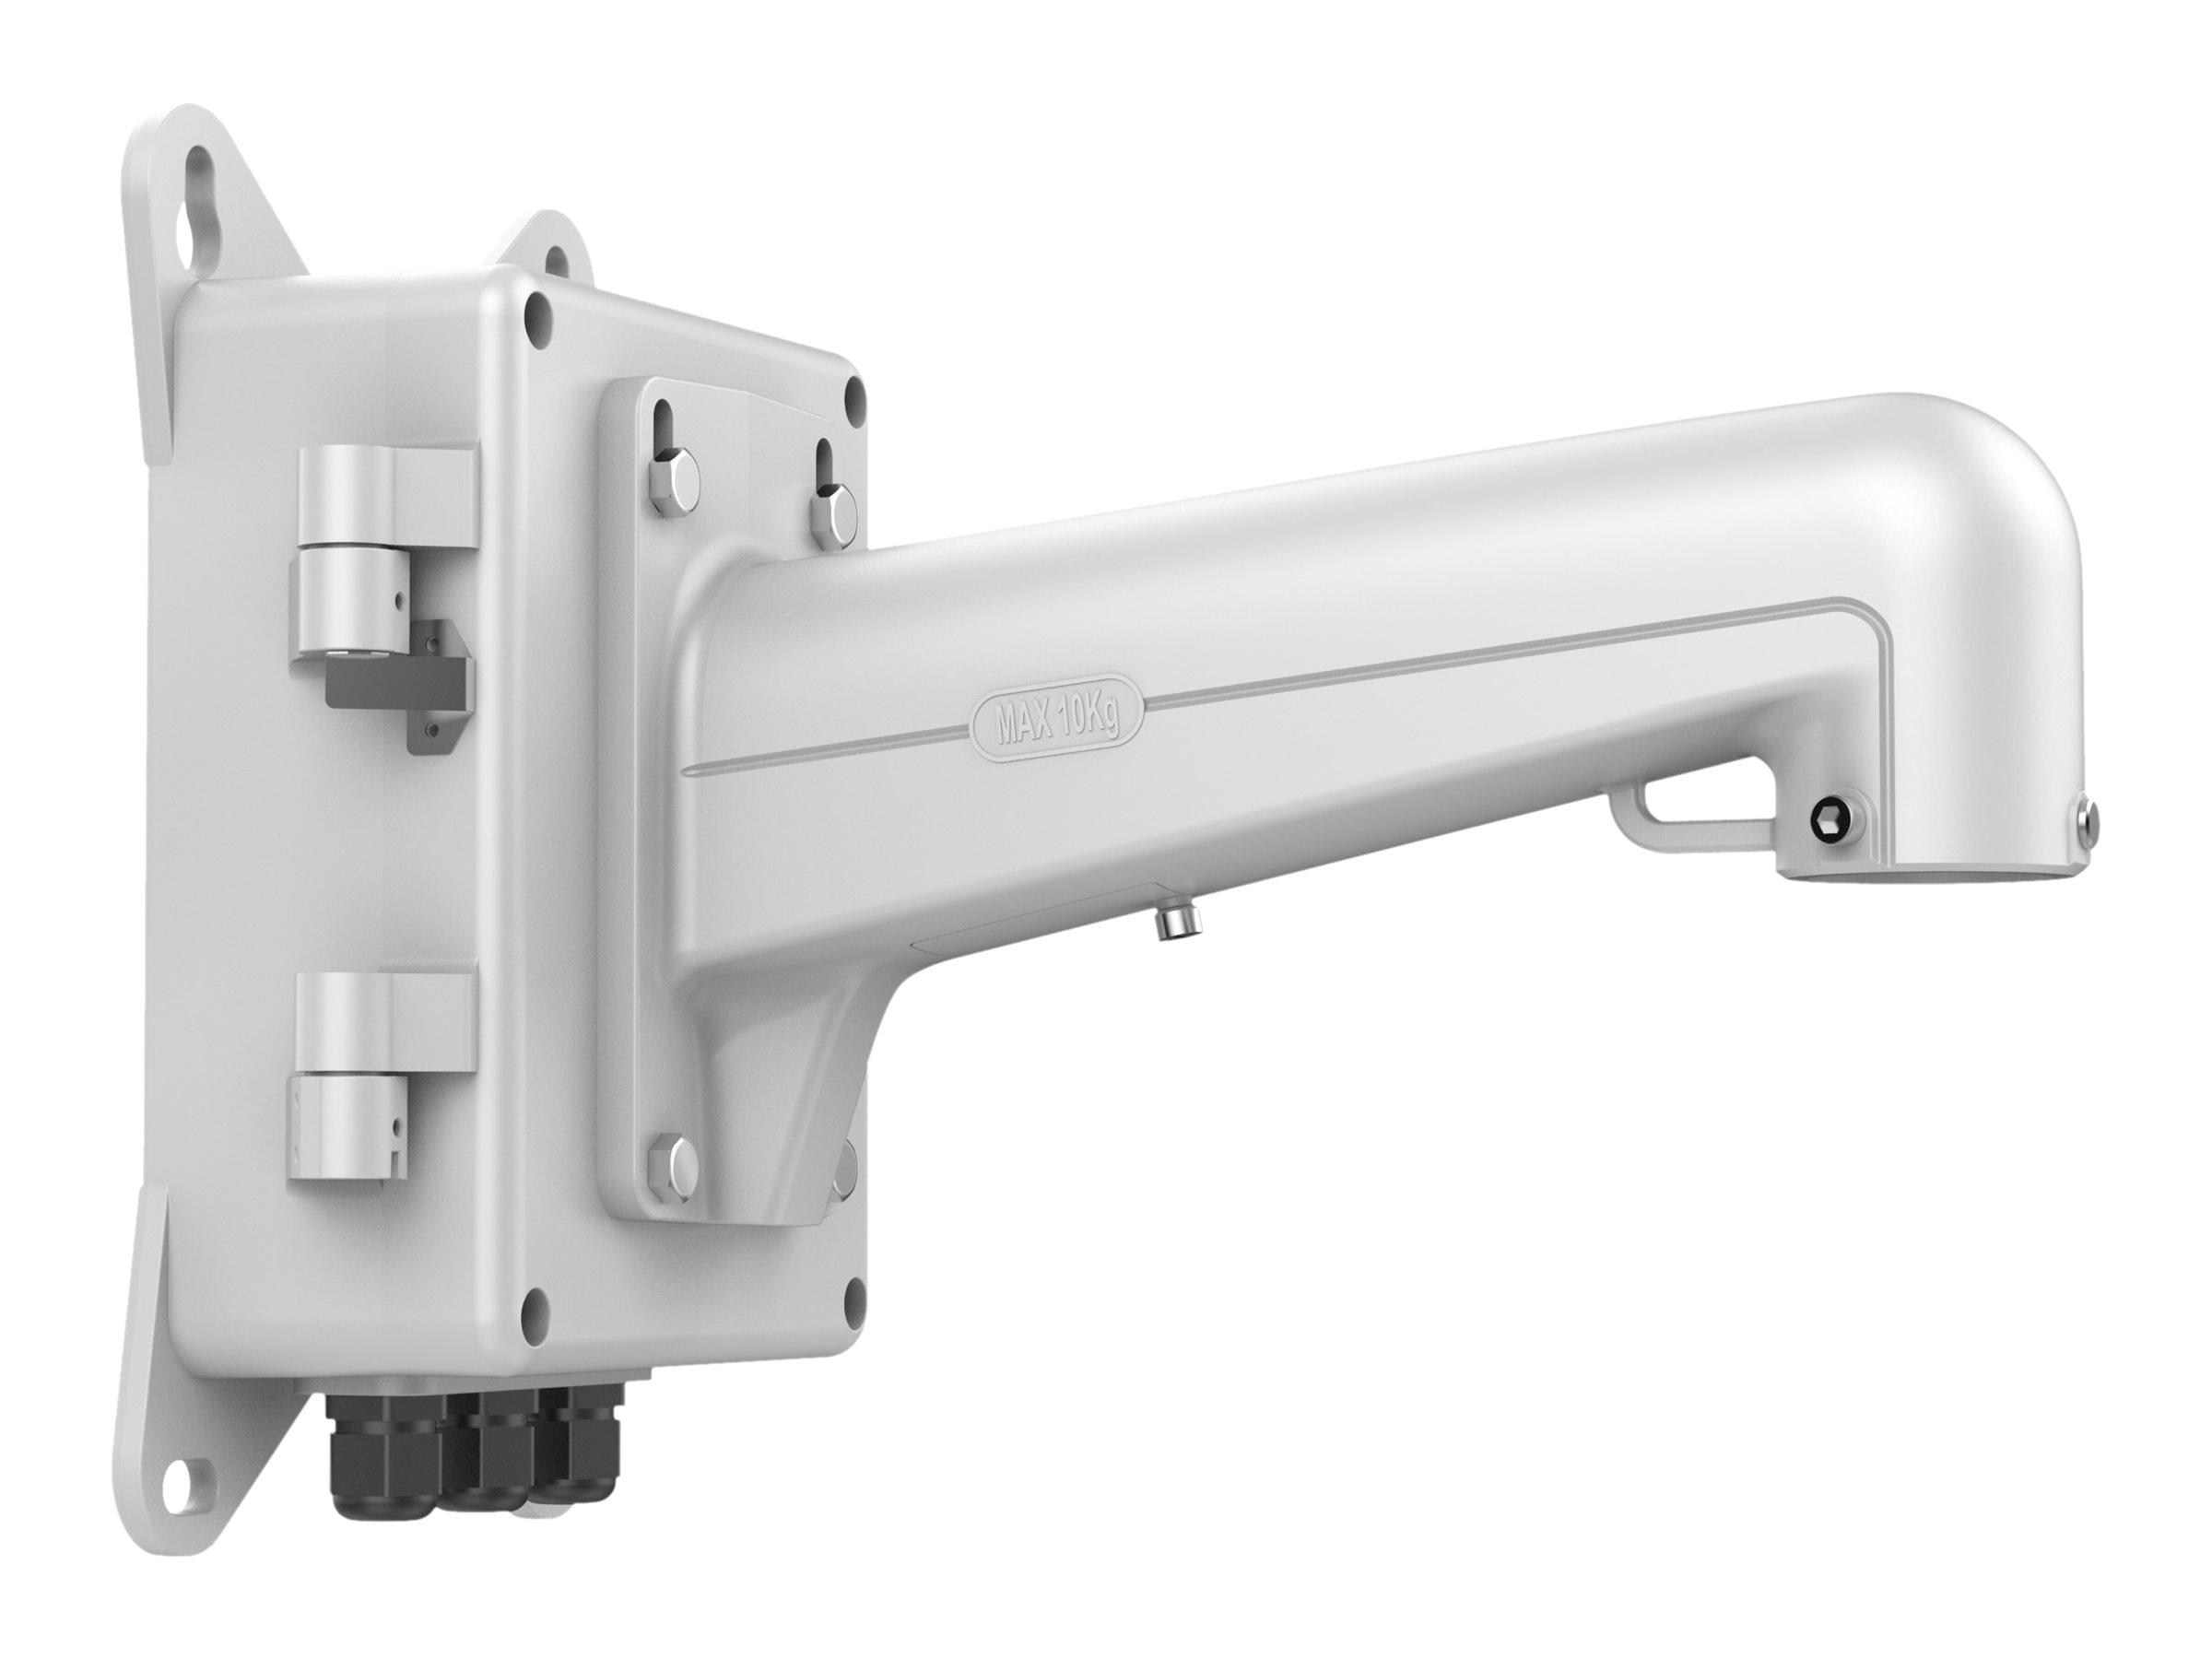 LevelOne CAS-7334 - camera mounting bracket